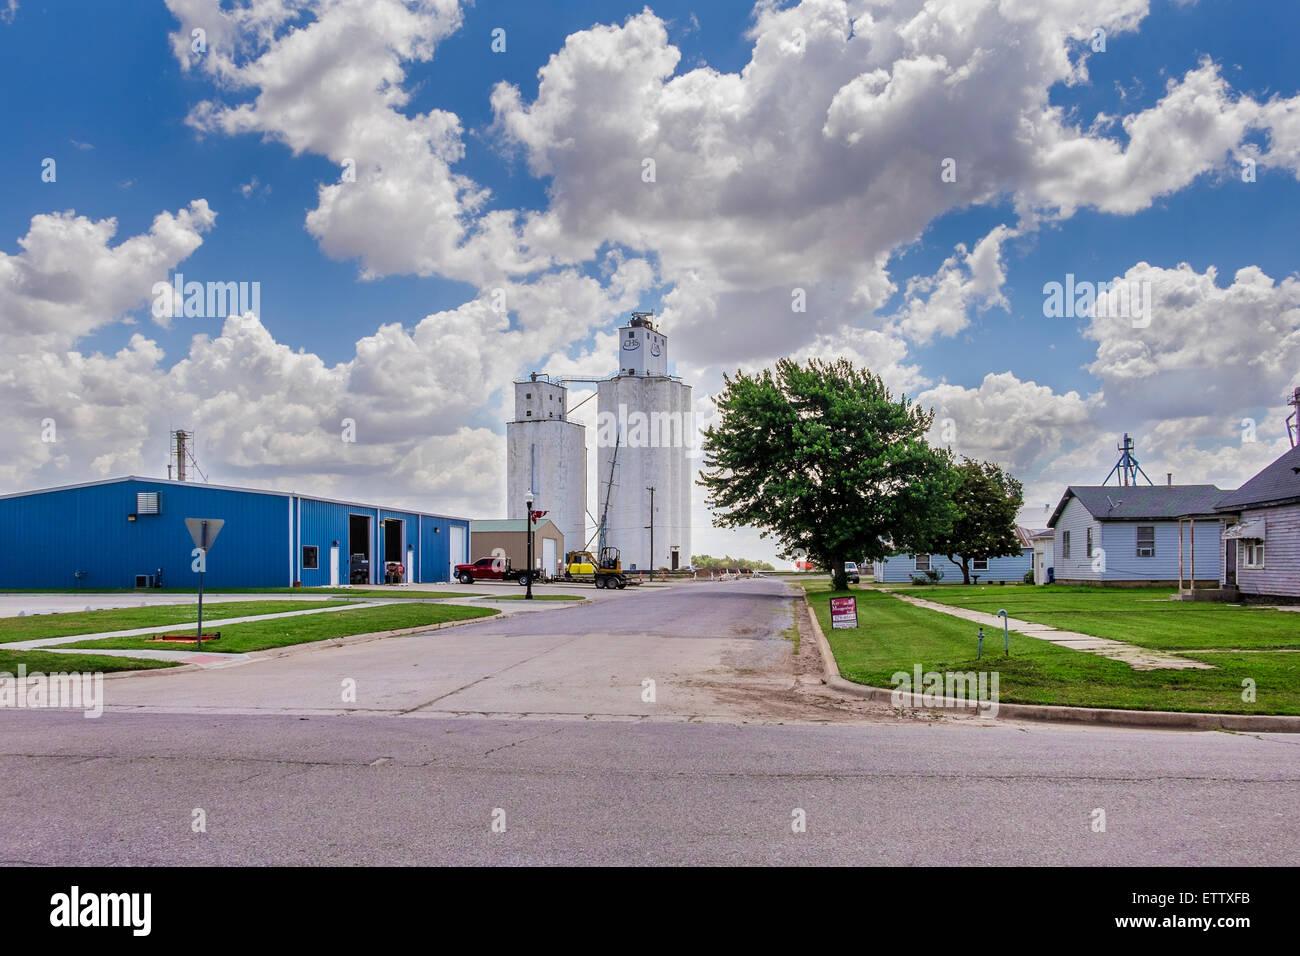 Grain elevators in a rural town of Okarche, Oklahoma, USA. - Stock Image